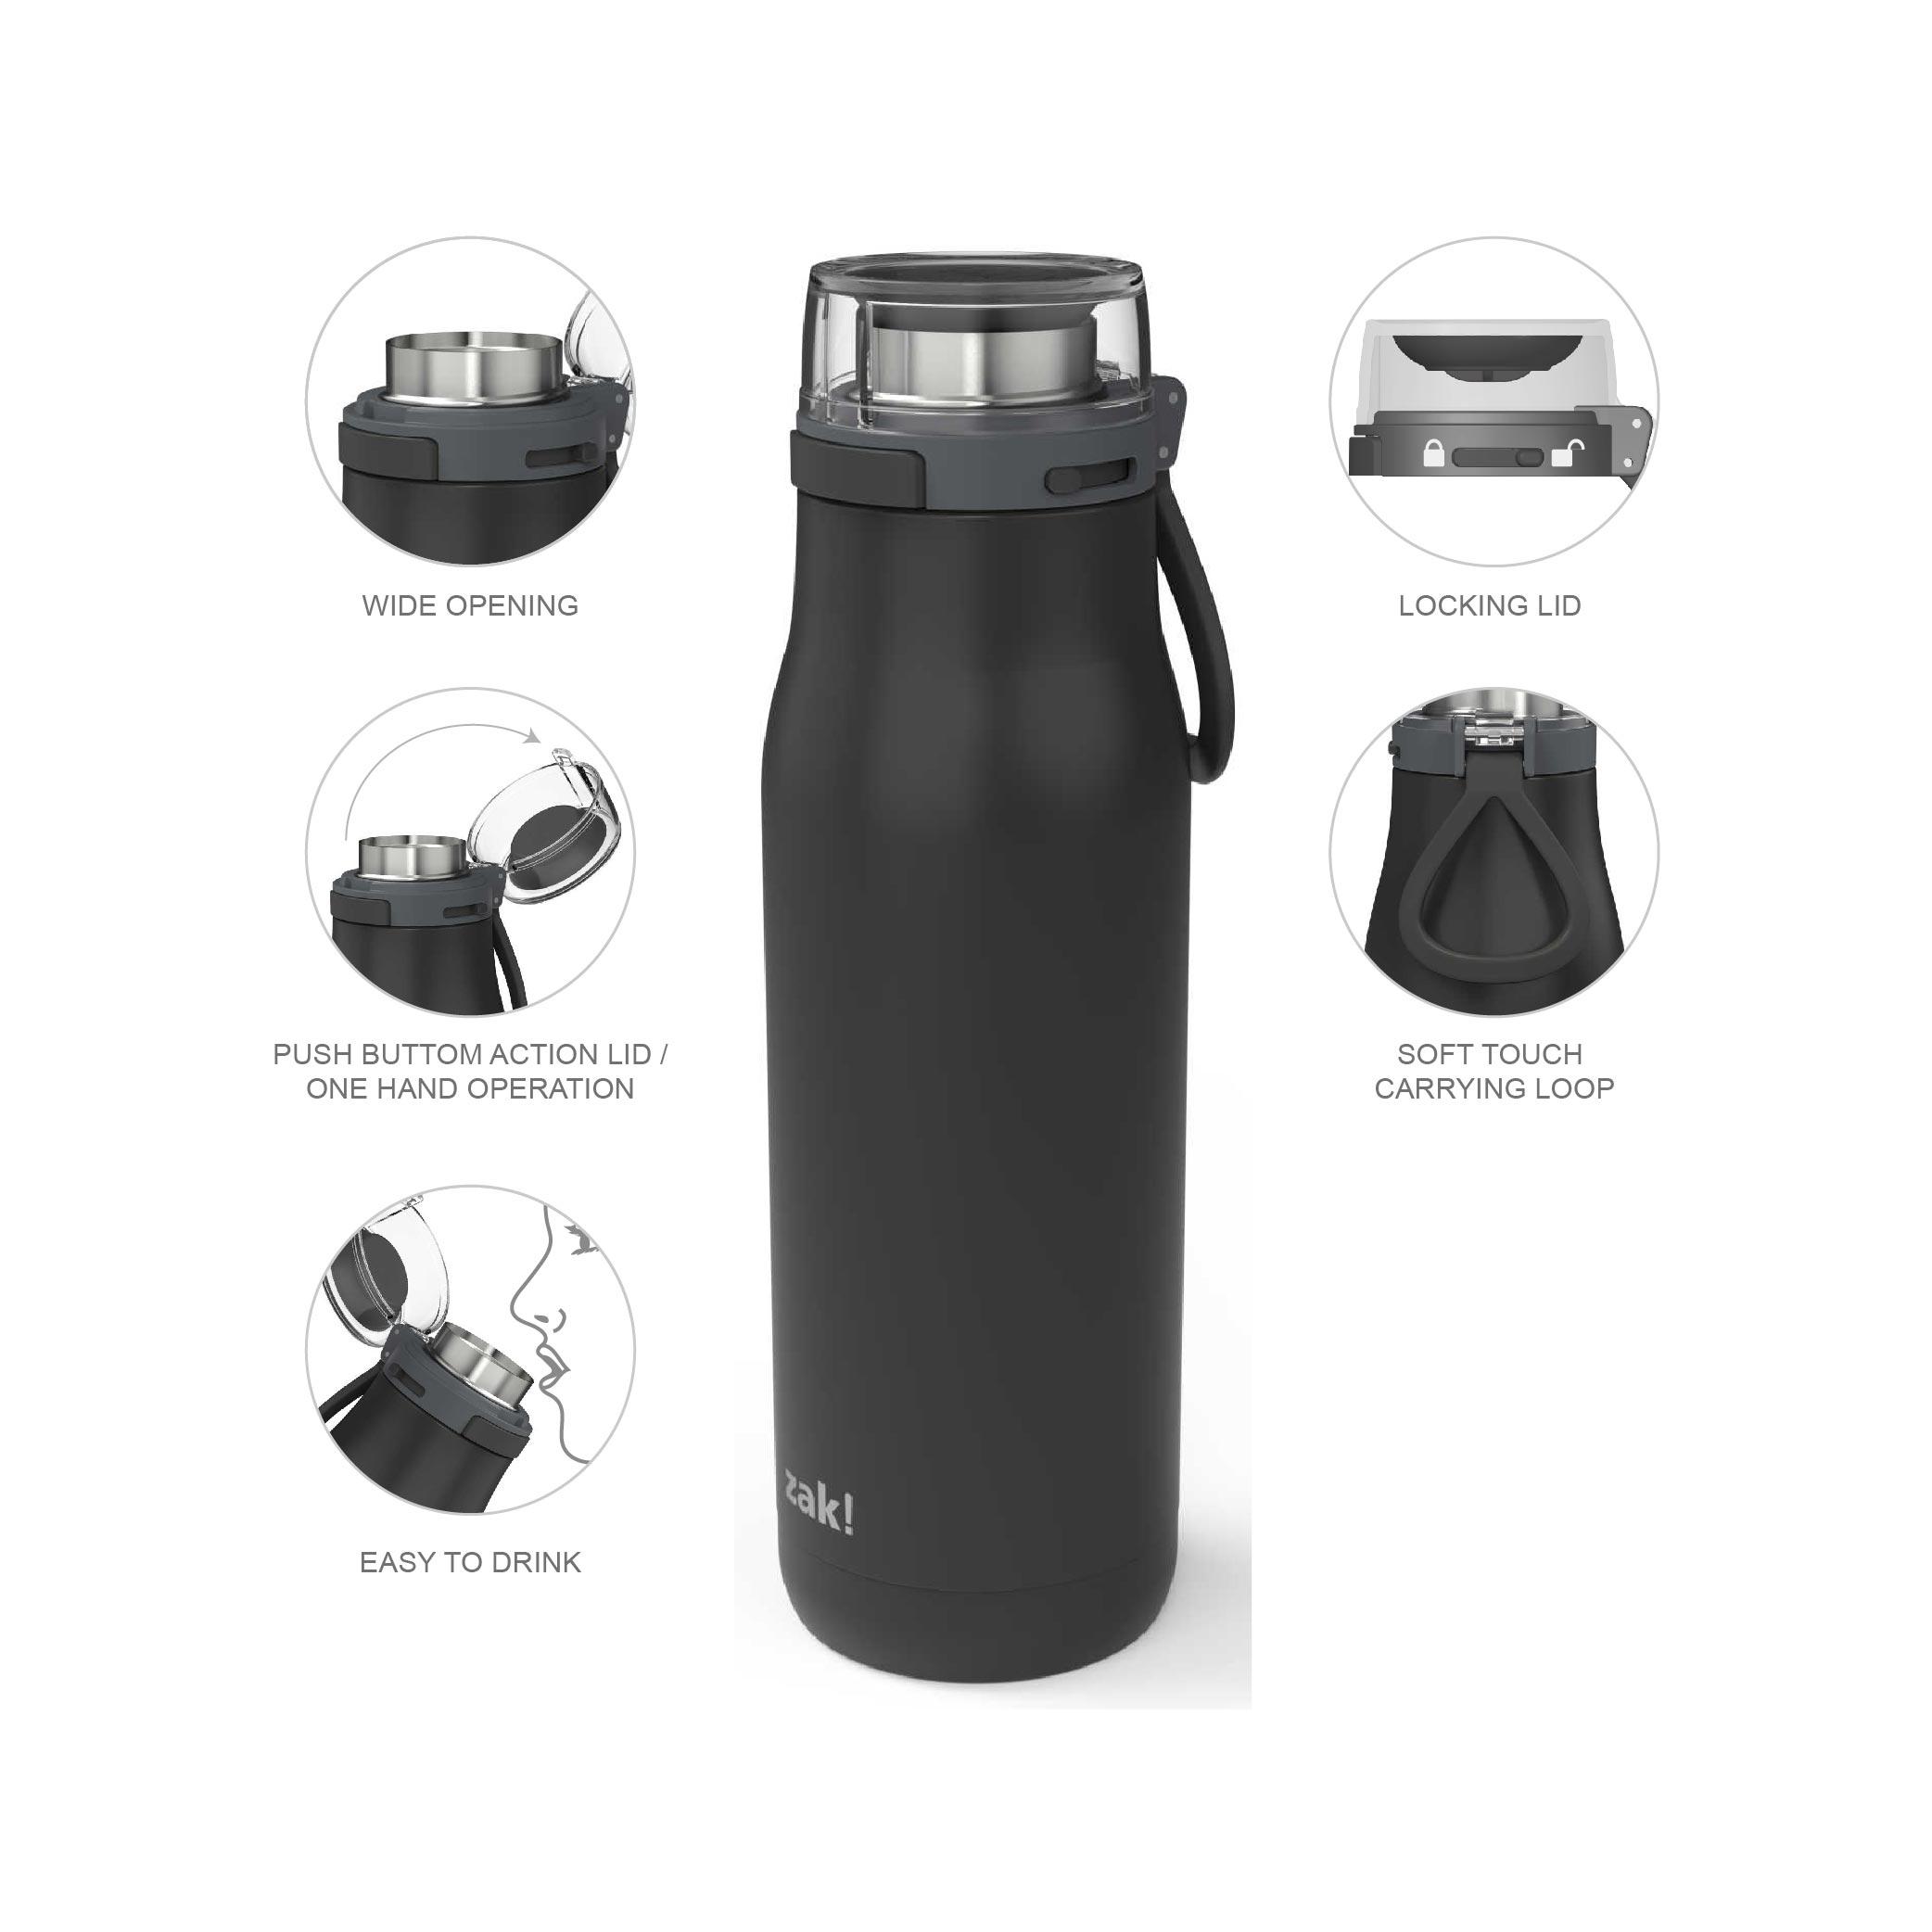 Kiona 20 ounce Vacuum Insulated Stainless Steel Tumbler, Indigo slideshow image 7